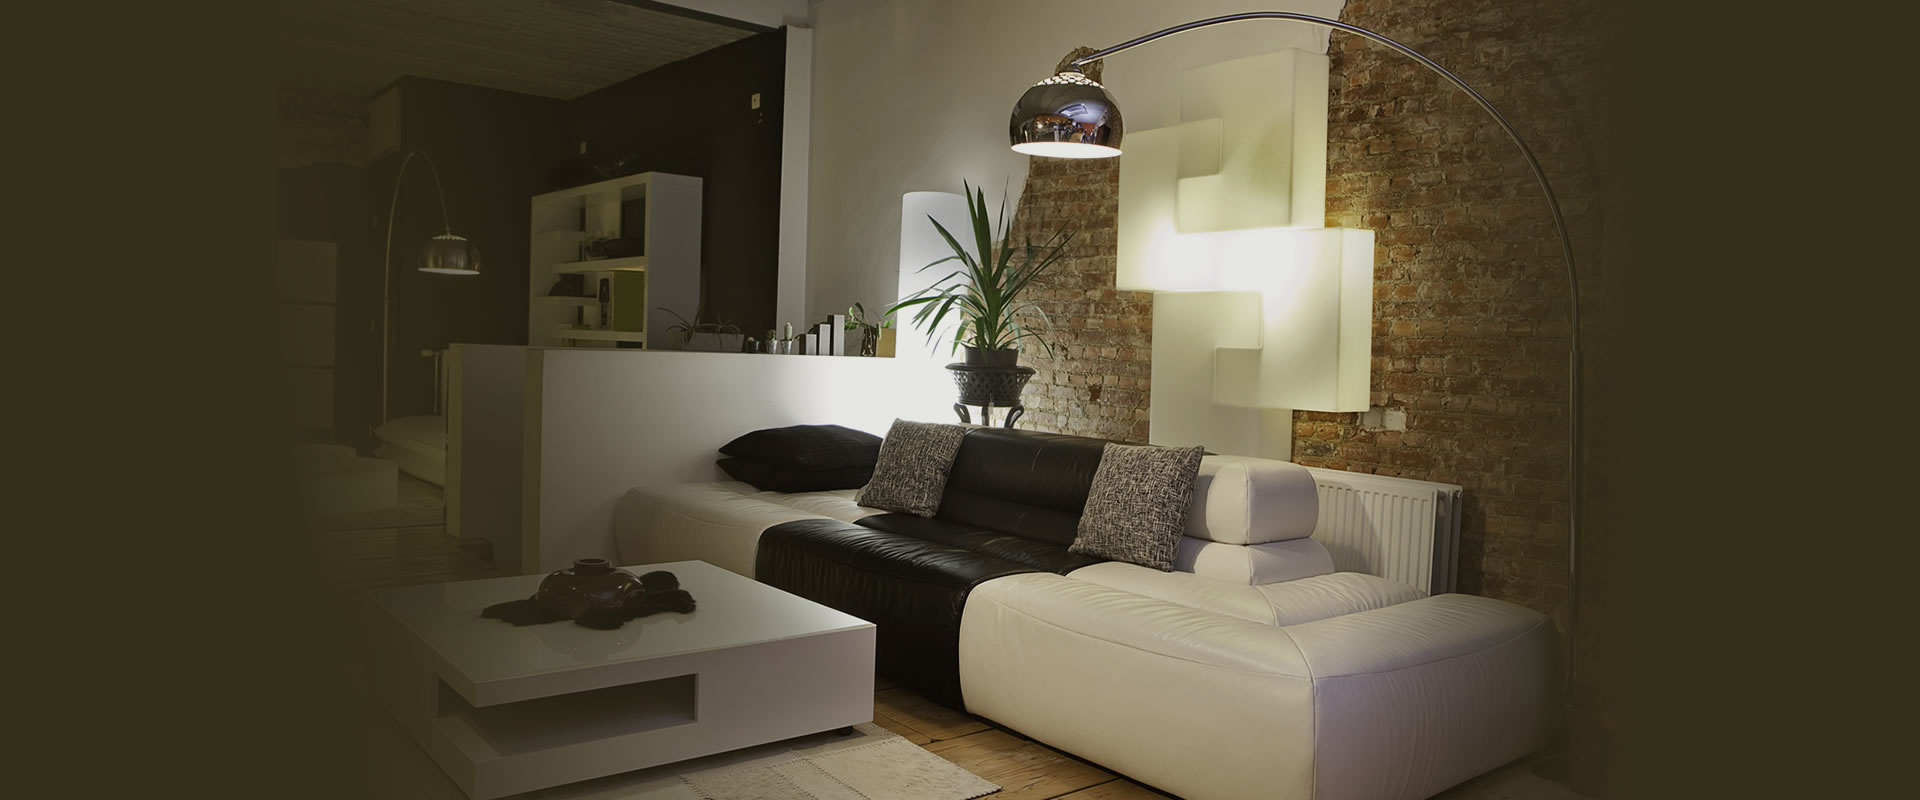 descubra la iluminacin led para el hogar